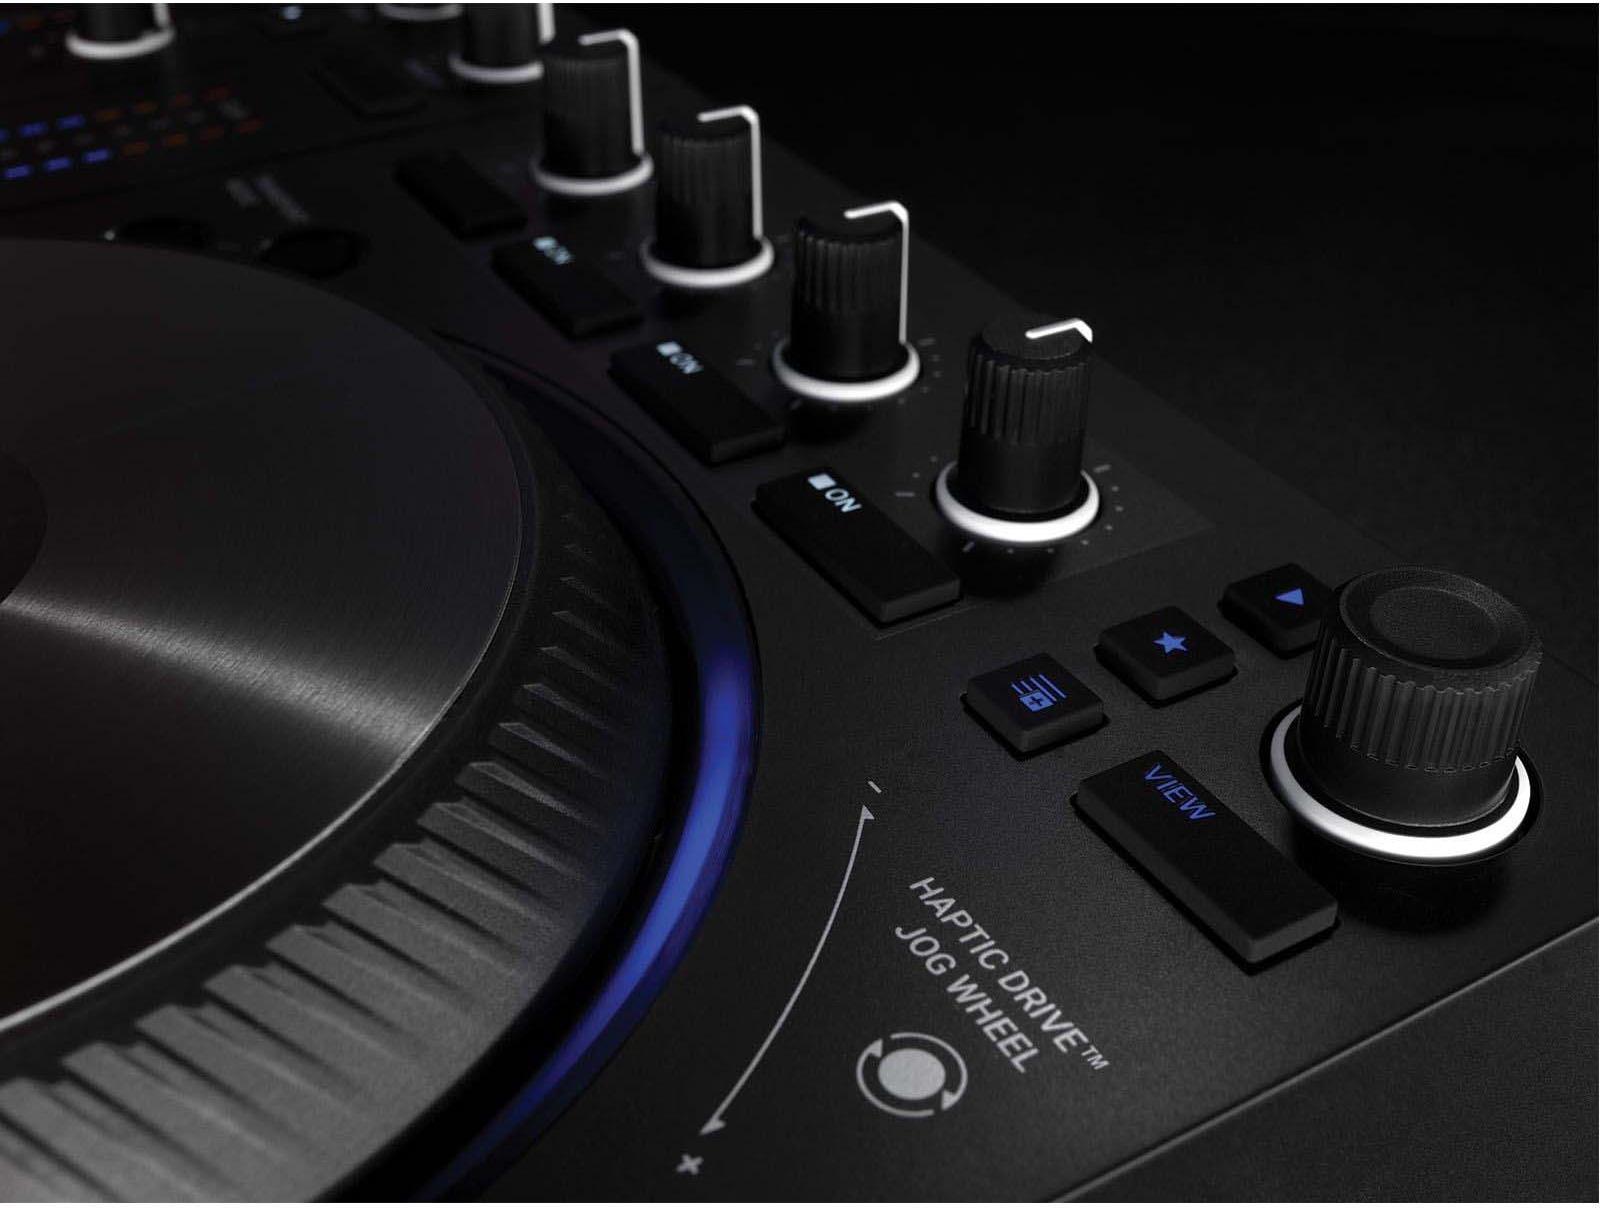 DJ-контроллер Native Instruments Traktor Kontrol S4 Mk3 Native Instruments